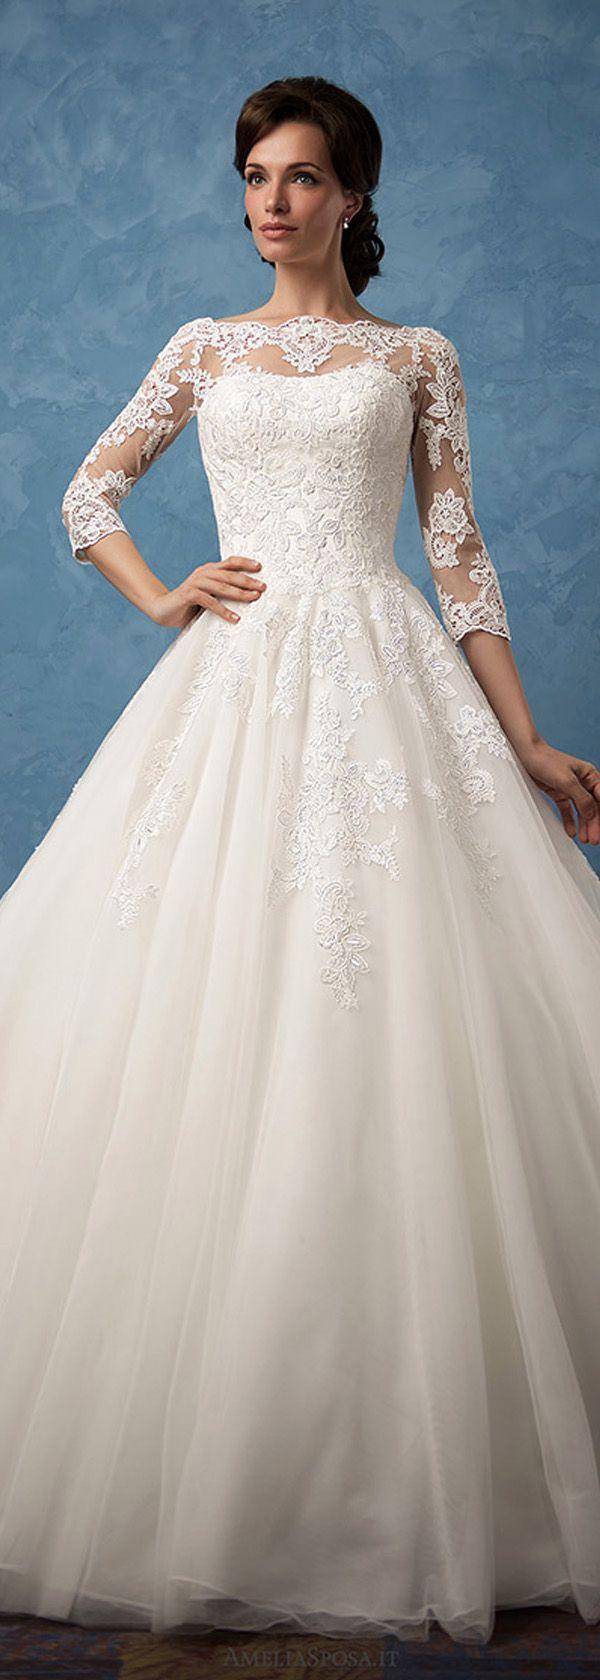 Charming Tulle & Satin Bateau Neckline A-Line Wedding Dresses With Lace Appliques